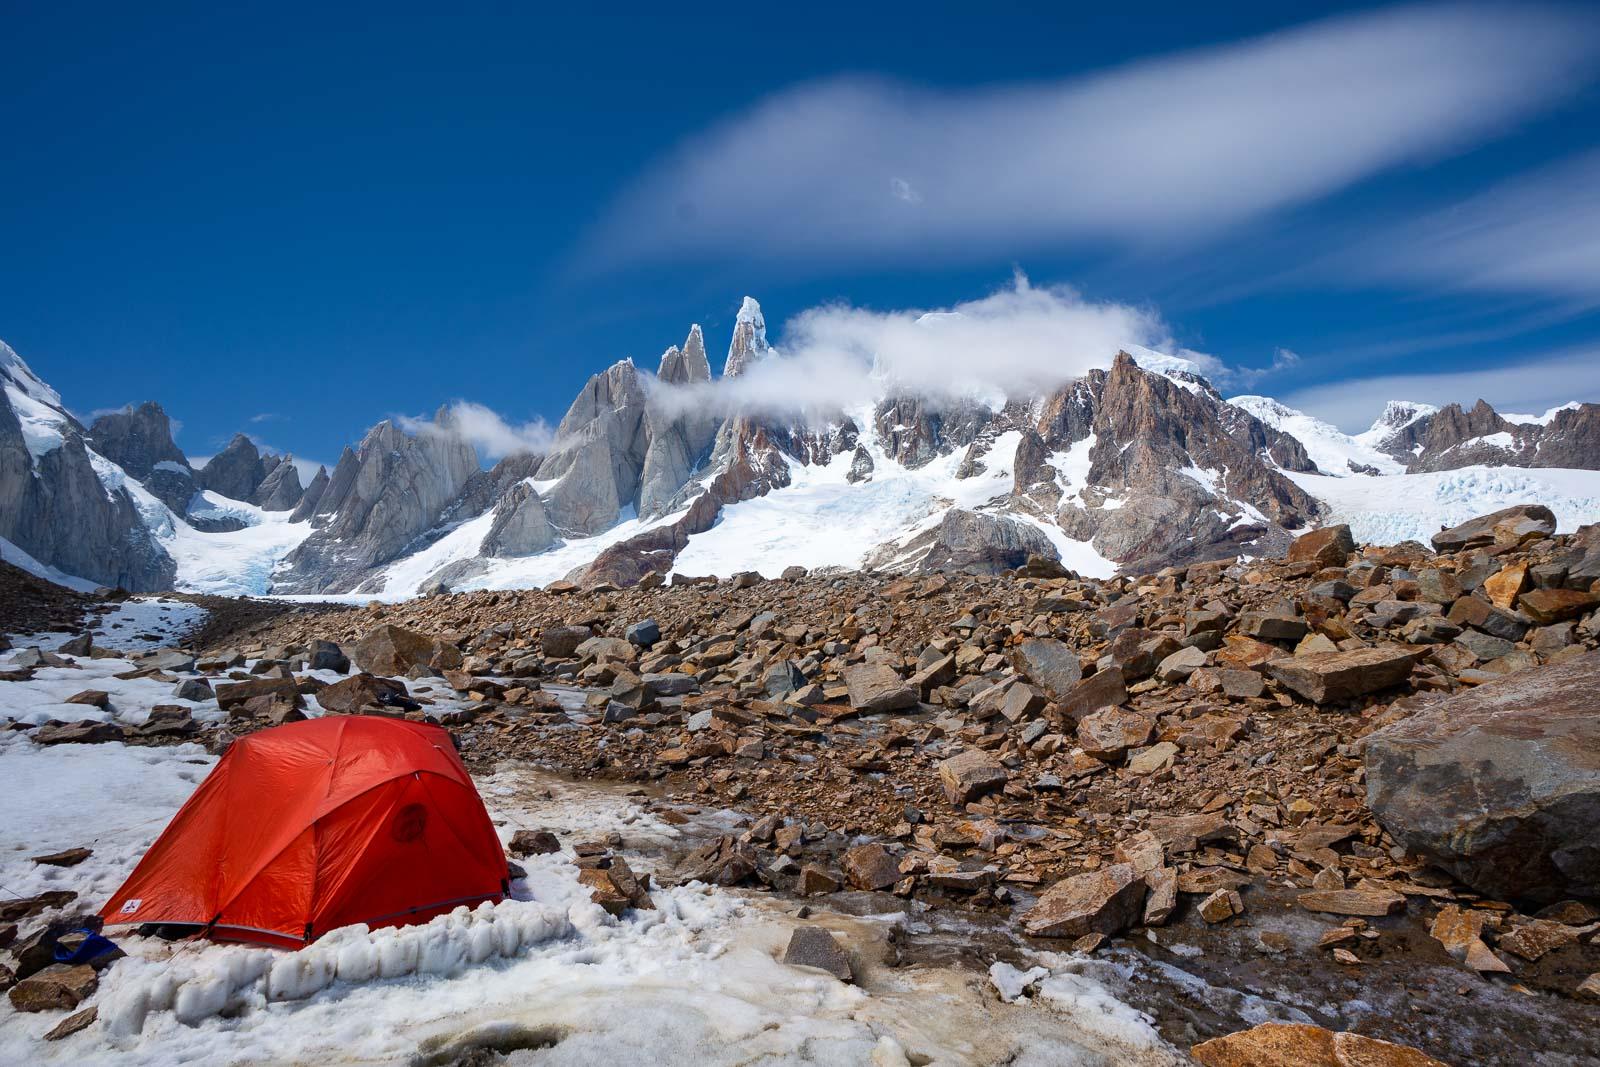 Best Backpacking Tents 2019 2019 Best Backpacking Tents | Lightweight & Ultralight   Adventure